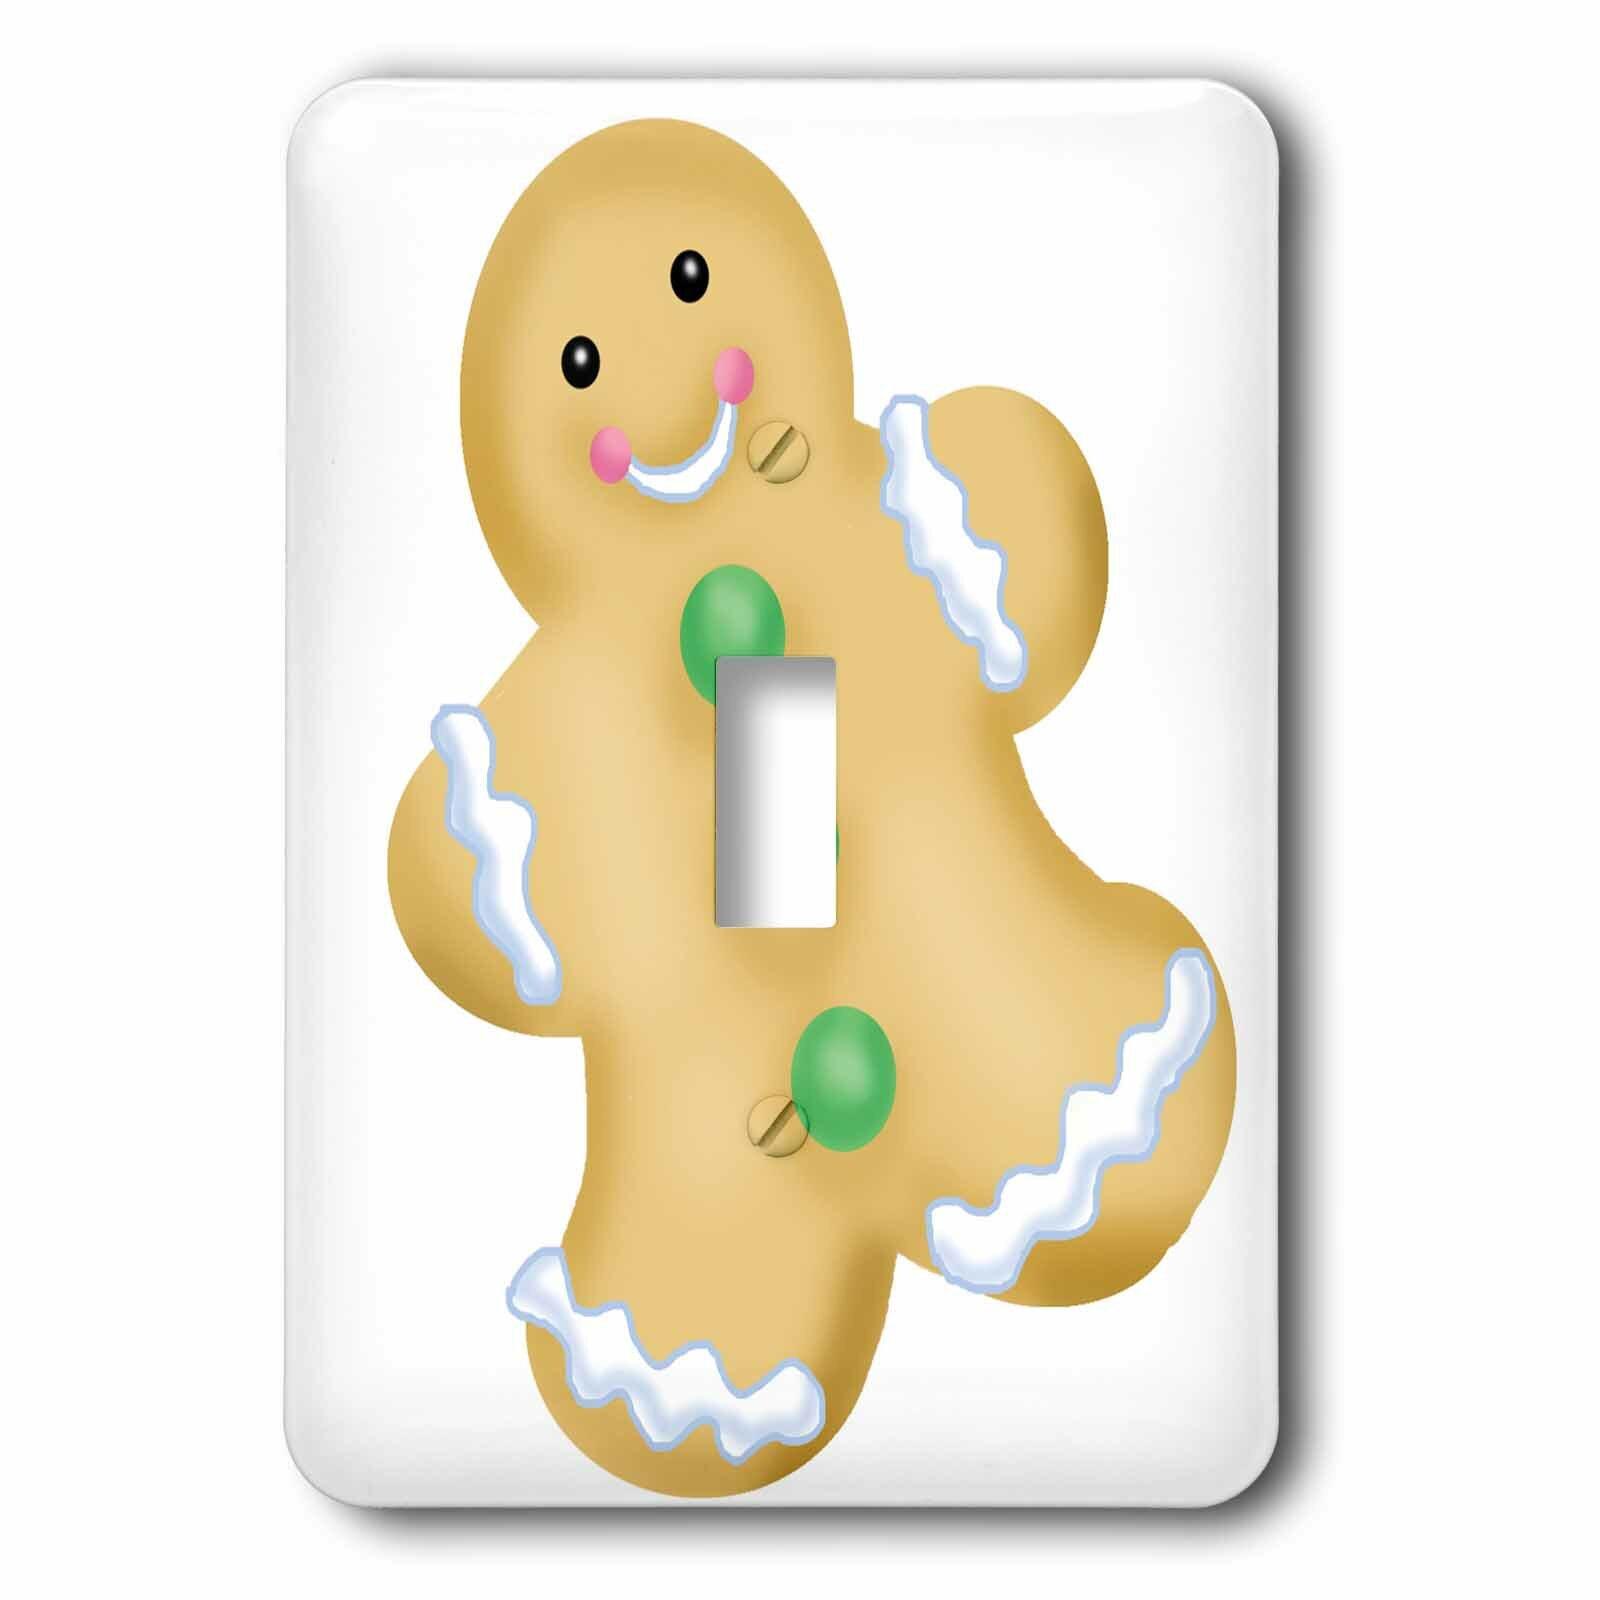 3drose Gingerbread Man 1 Gang Toggle Light Switch Wall Plate Wayfair Ca